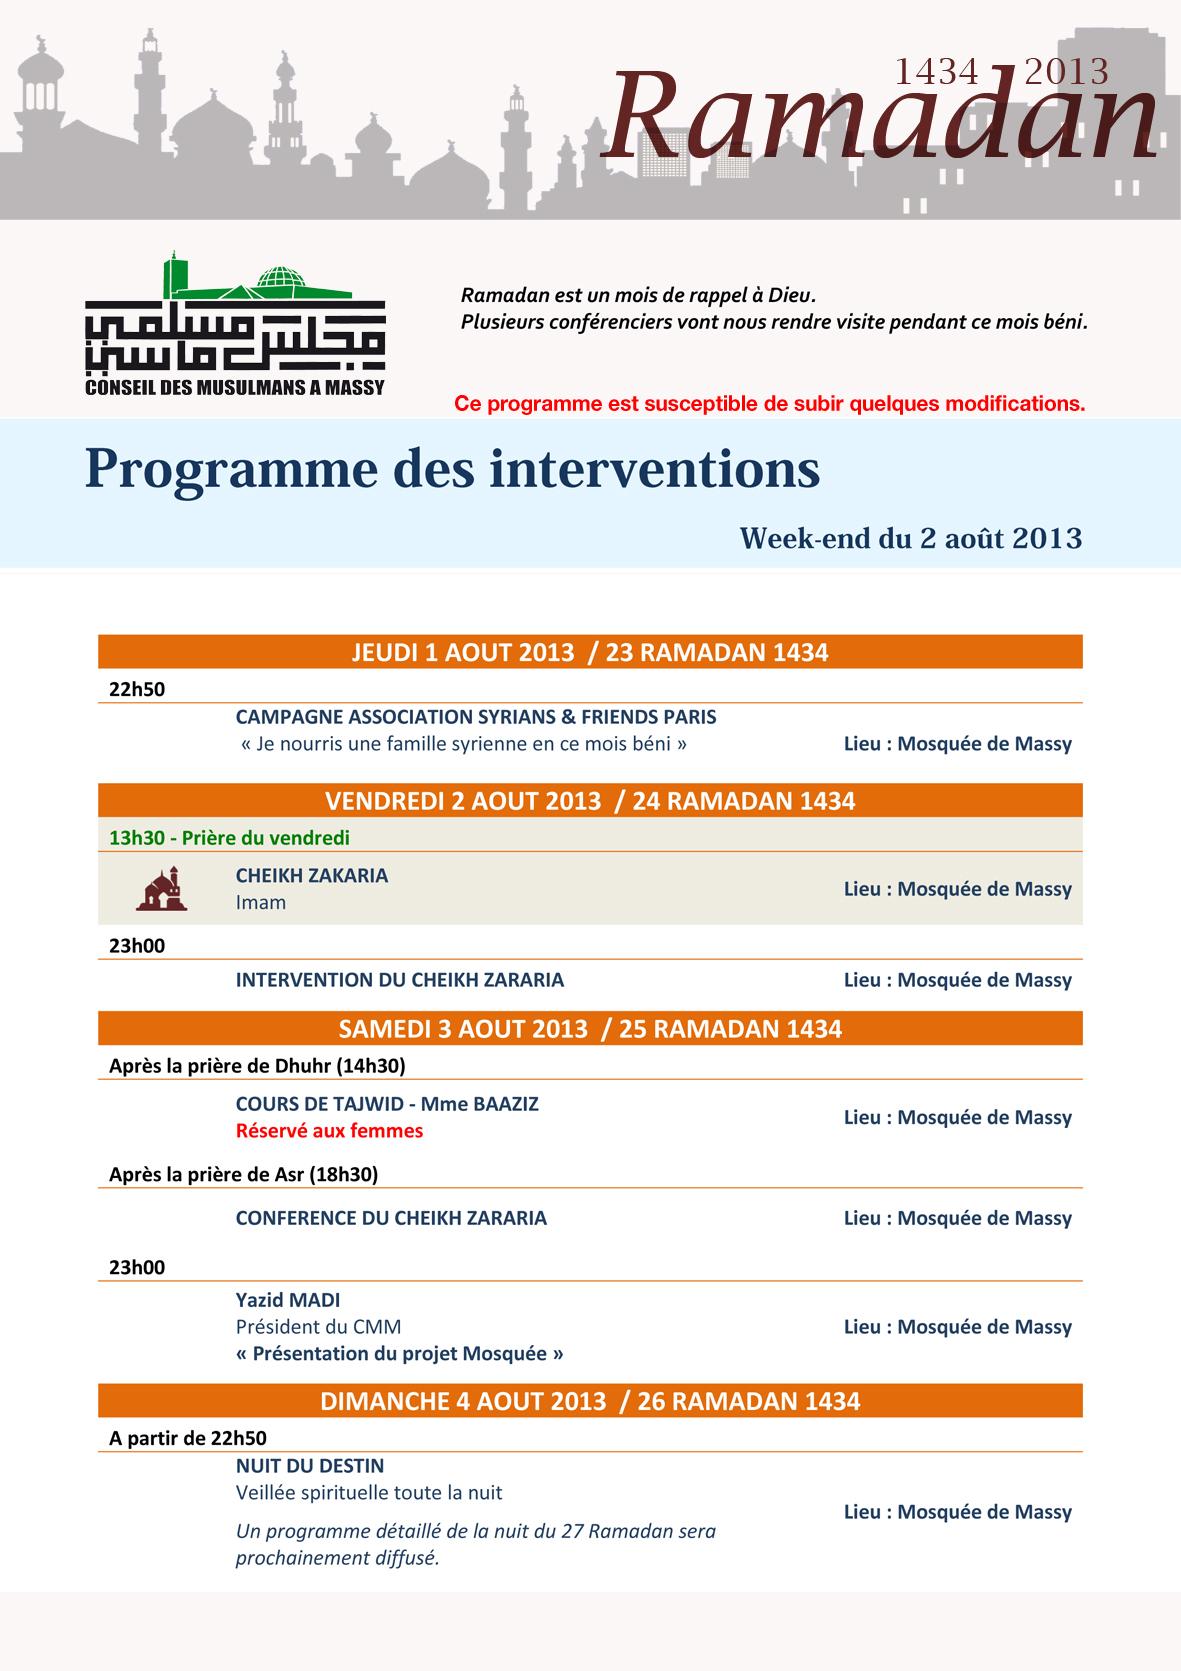 Programme des interventions - week-end du 2 août 2013